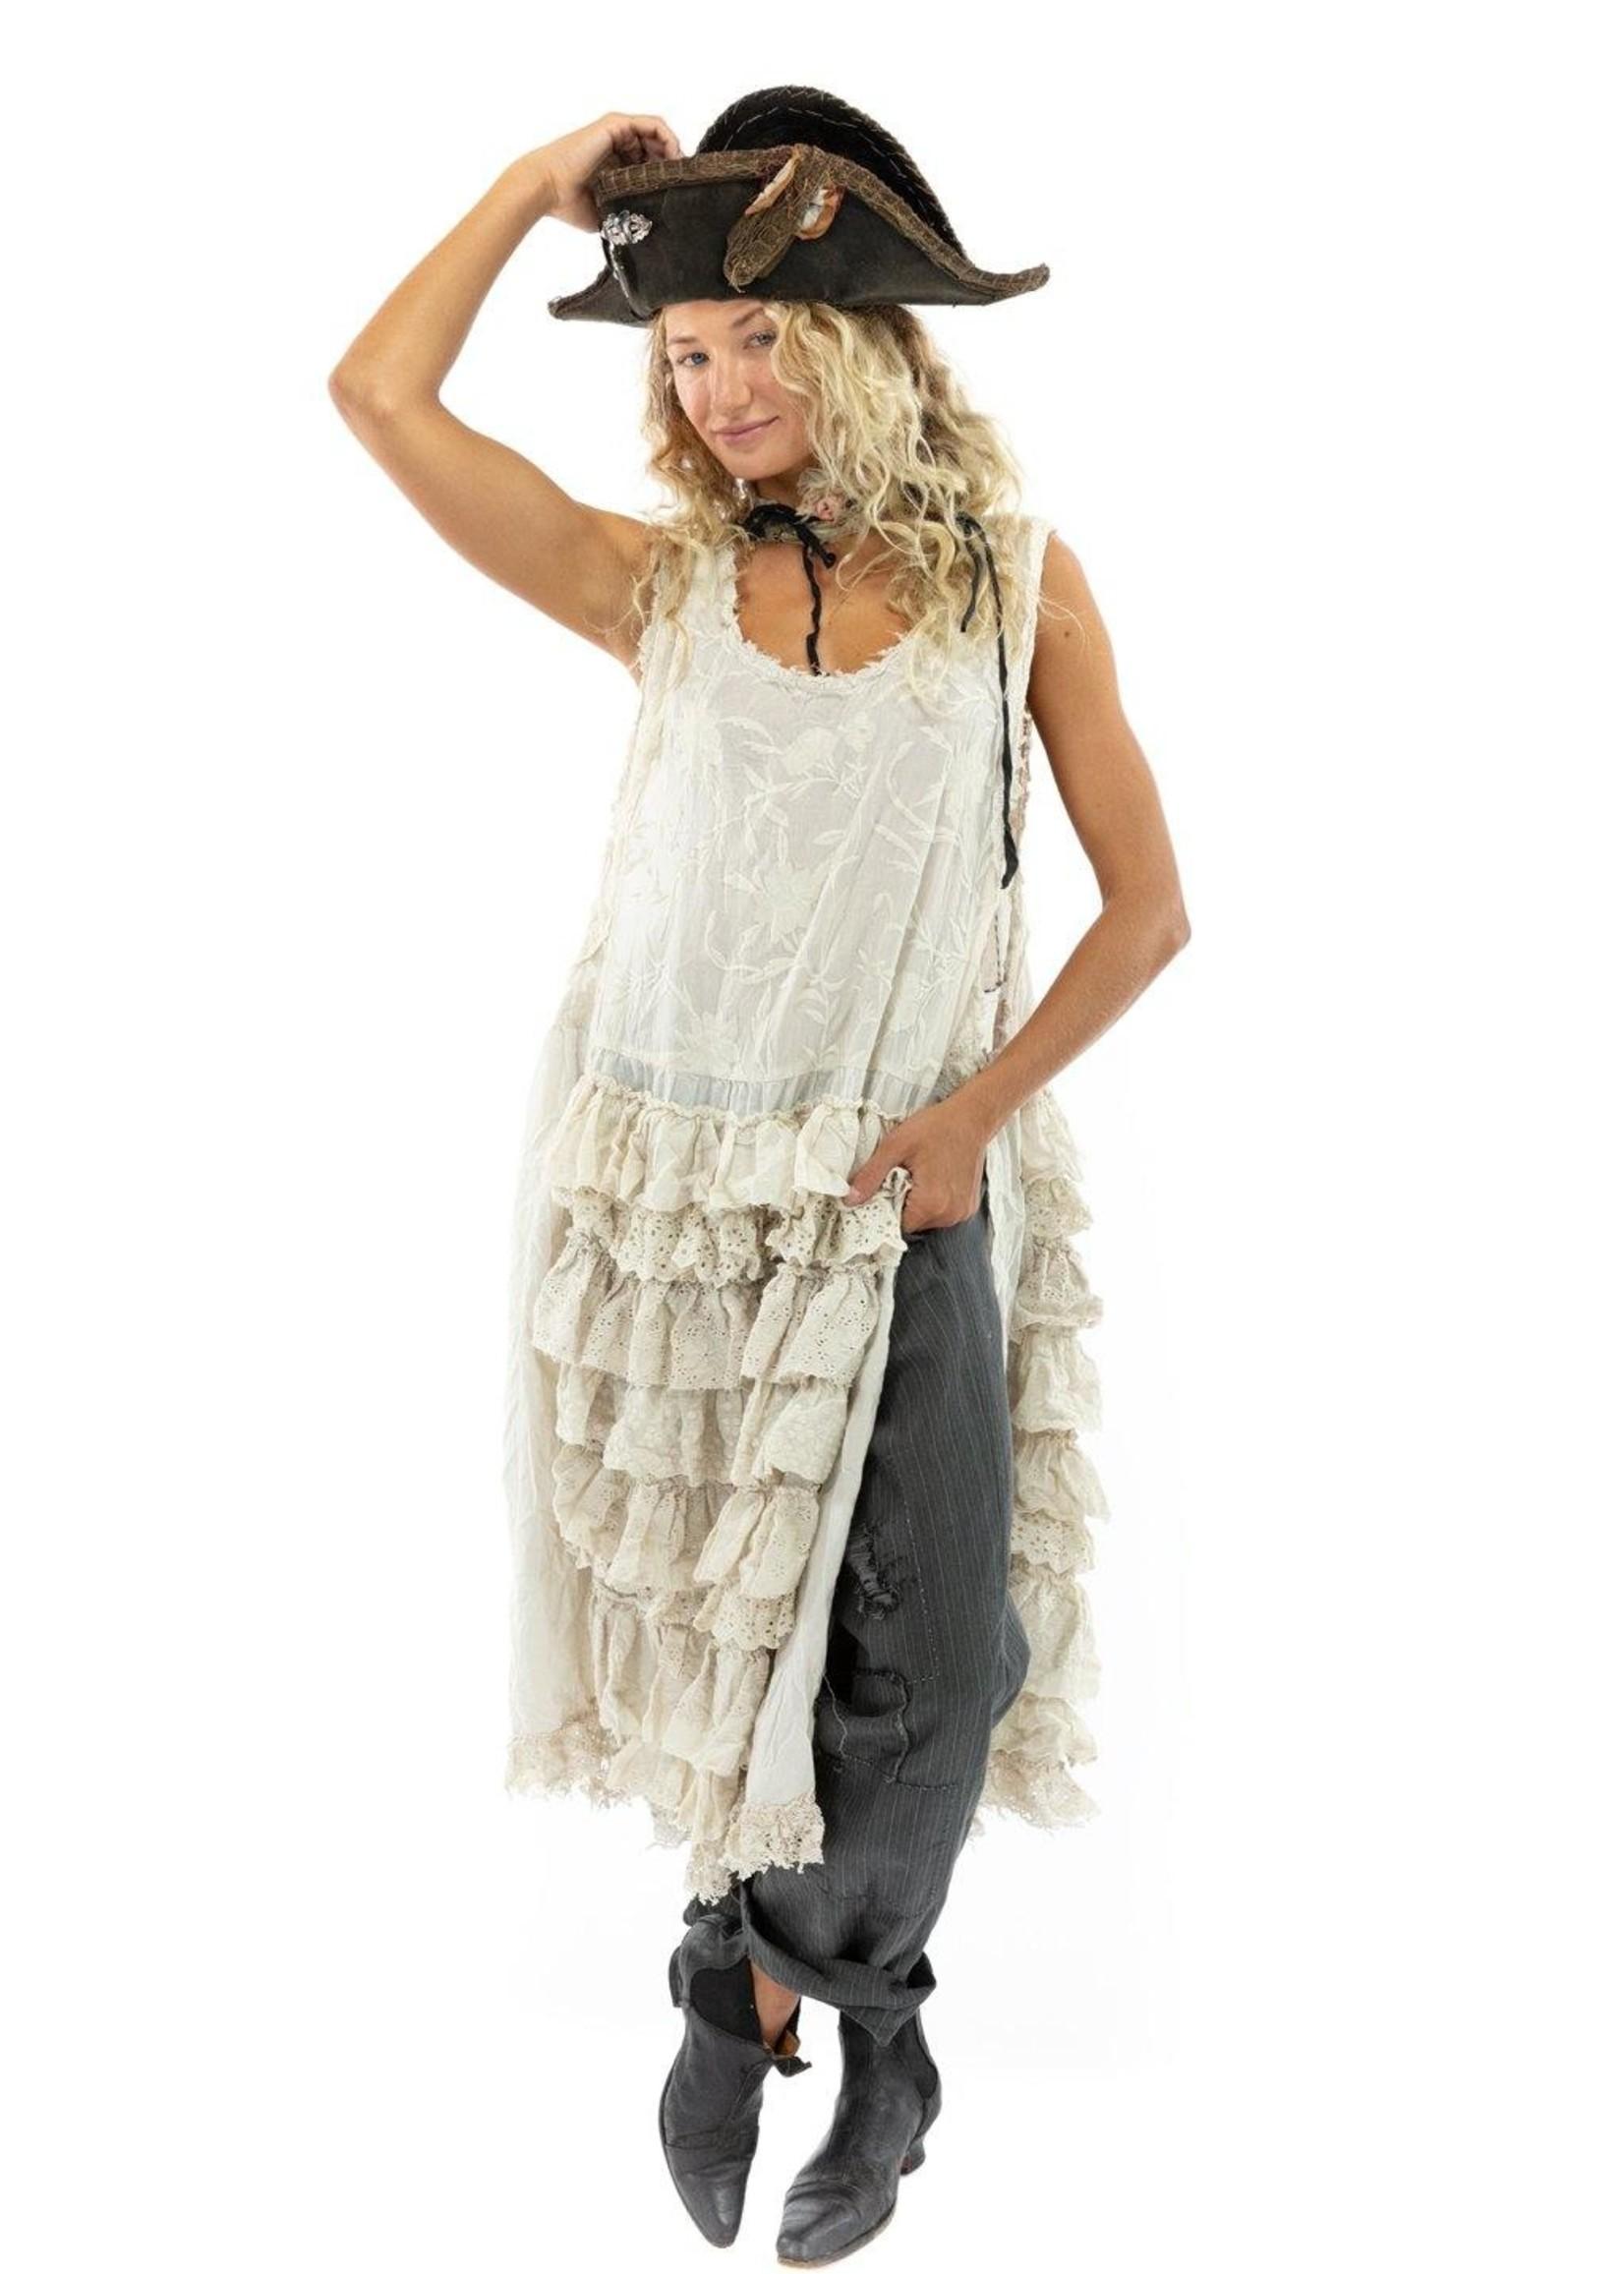 Magnolia Pearl Risette Apron Dress - Moonlight